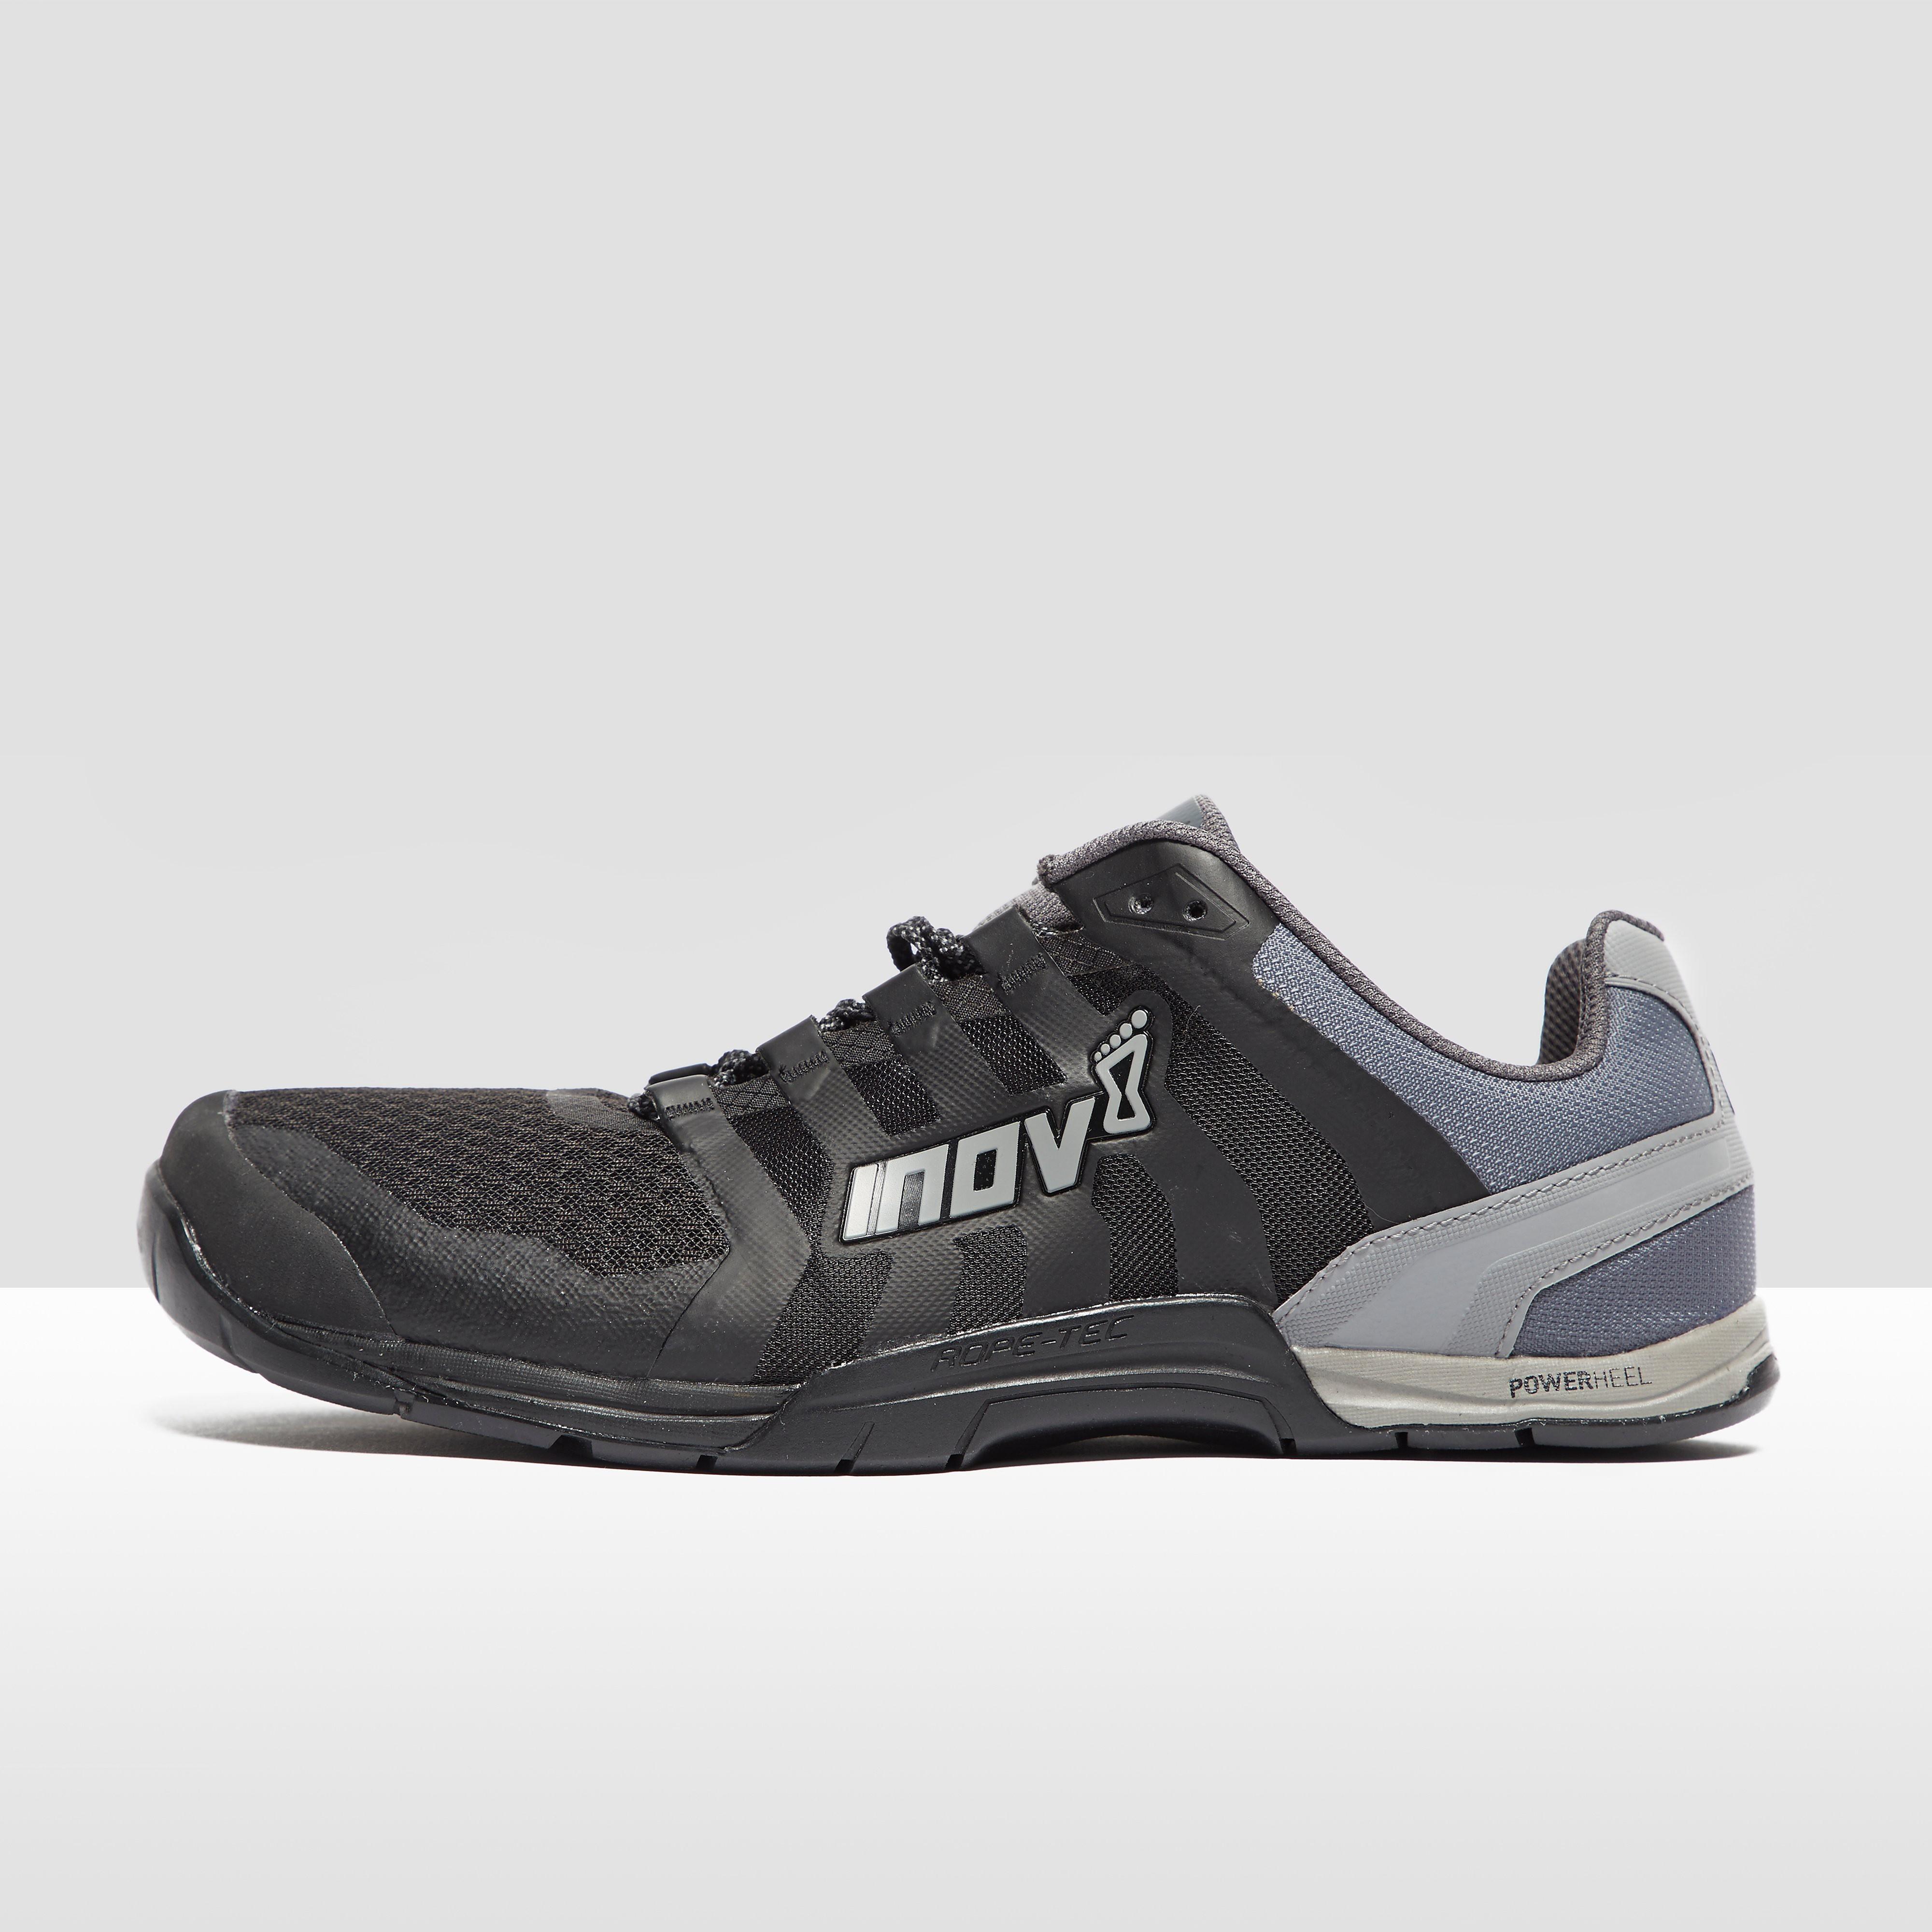 Inov-8 F-LITE 235 V2 Men's Training Shoes